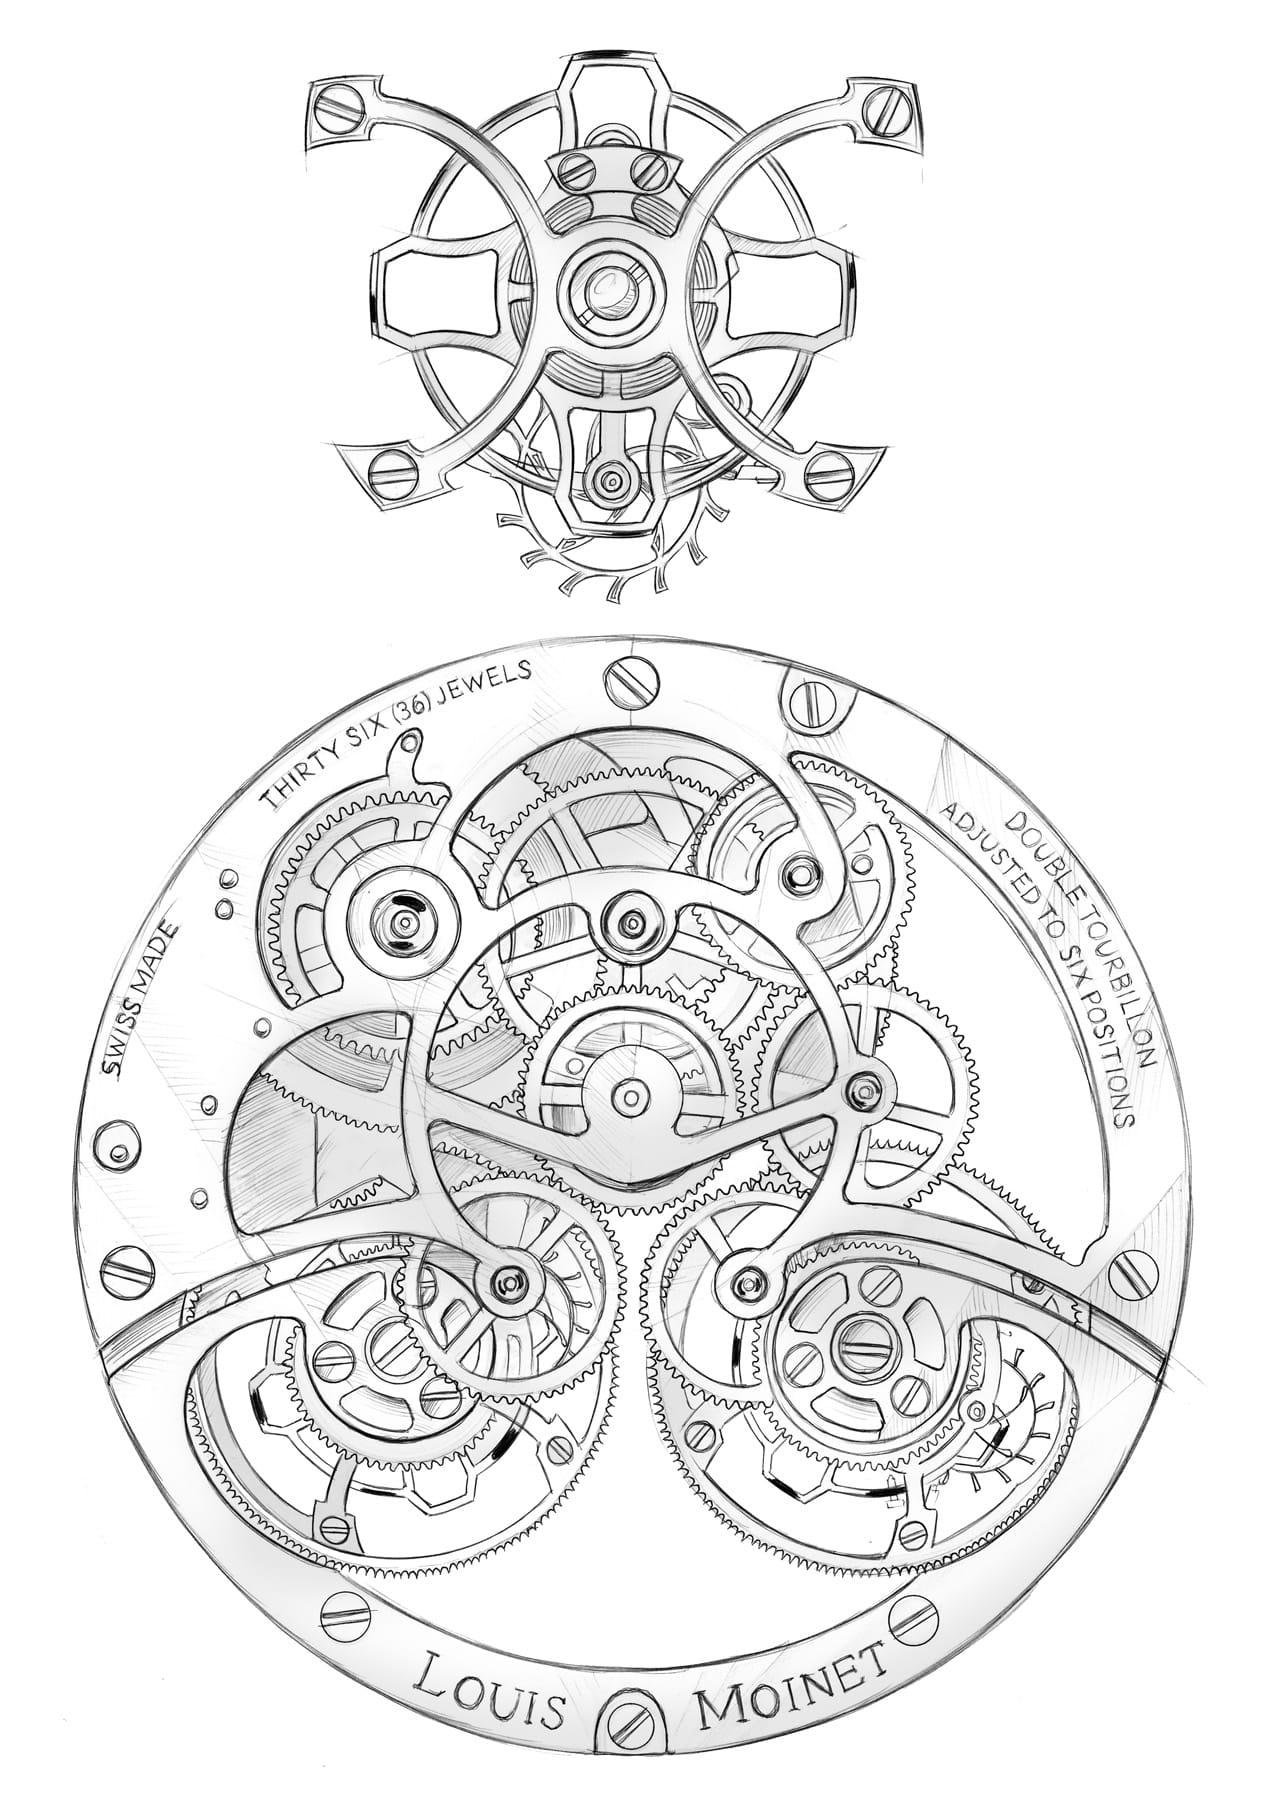 Louis Moinet's Sideralis